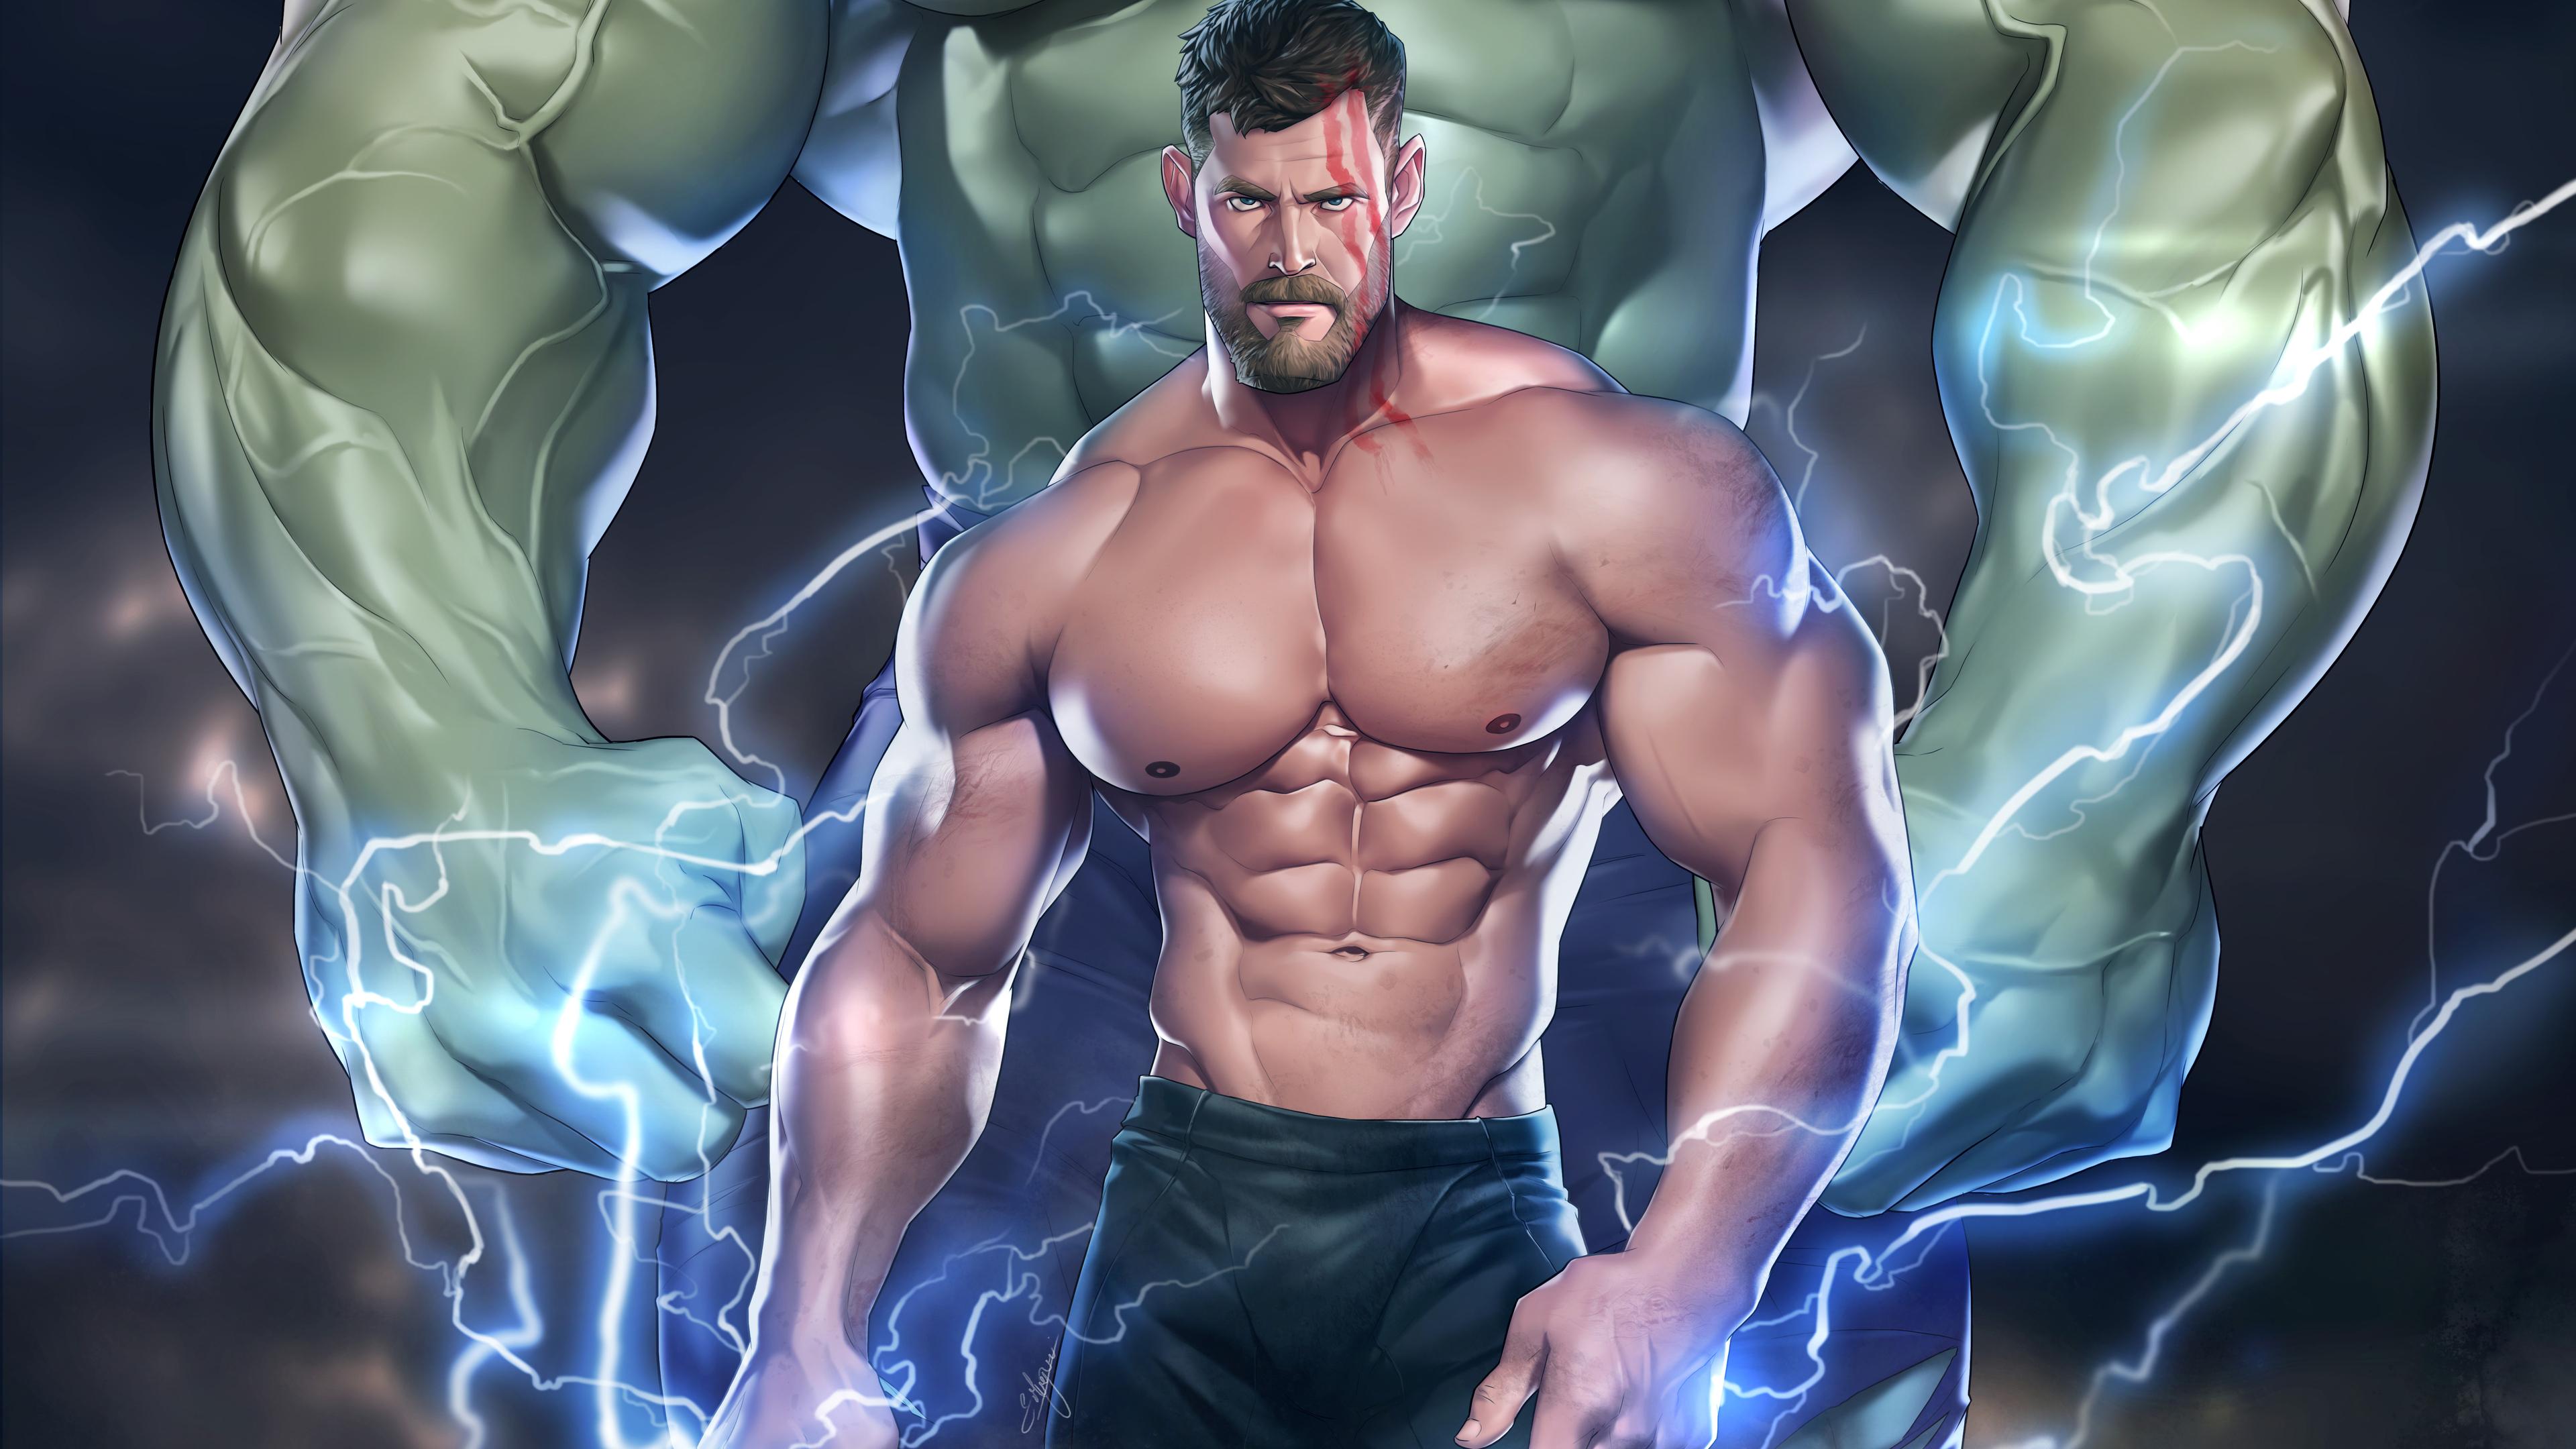 muscular thor 4k 1553072193 - Muscular Thor 4k - thor wallpapers, superheroes wallpapers, hd-wallpapers, digital art wallpapers, deviantart wallpapers, artwork wallpapers, artist wallpapers, 5k wallpapers, 4k-wallpapers